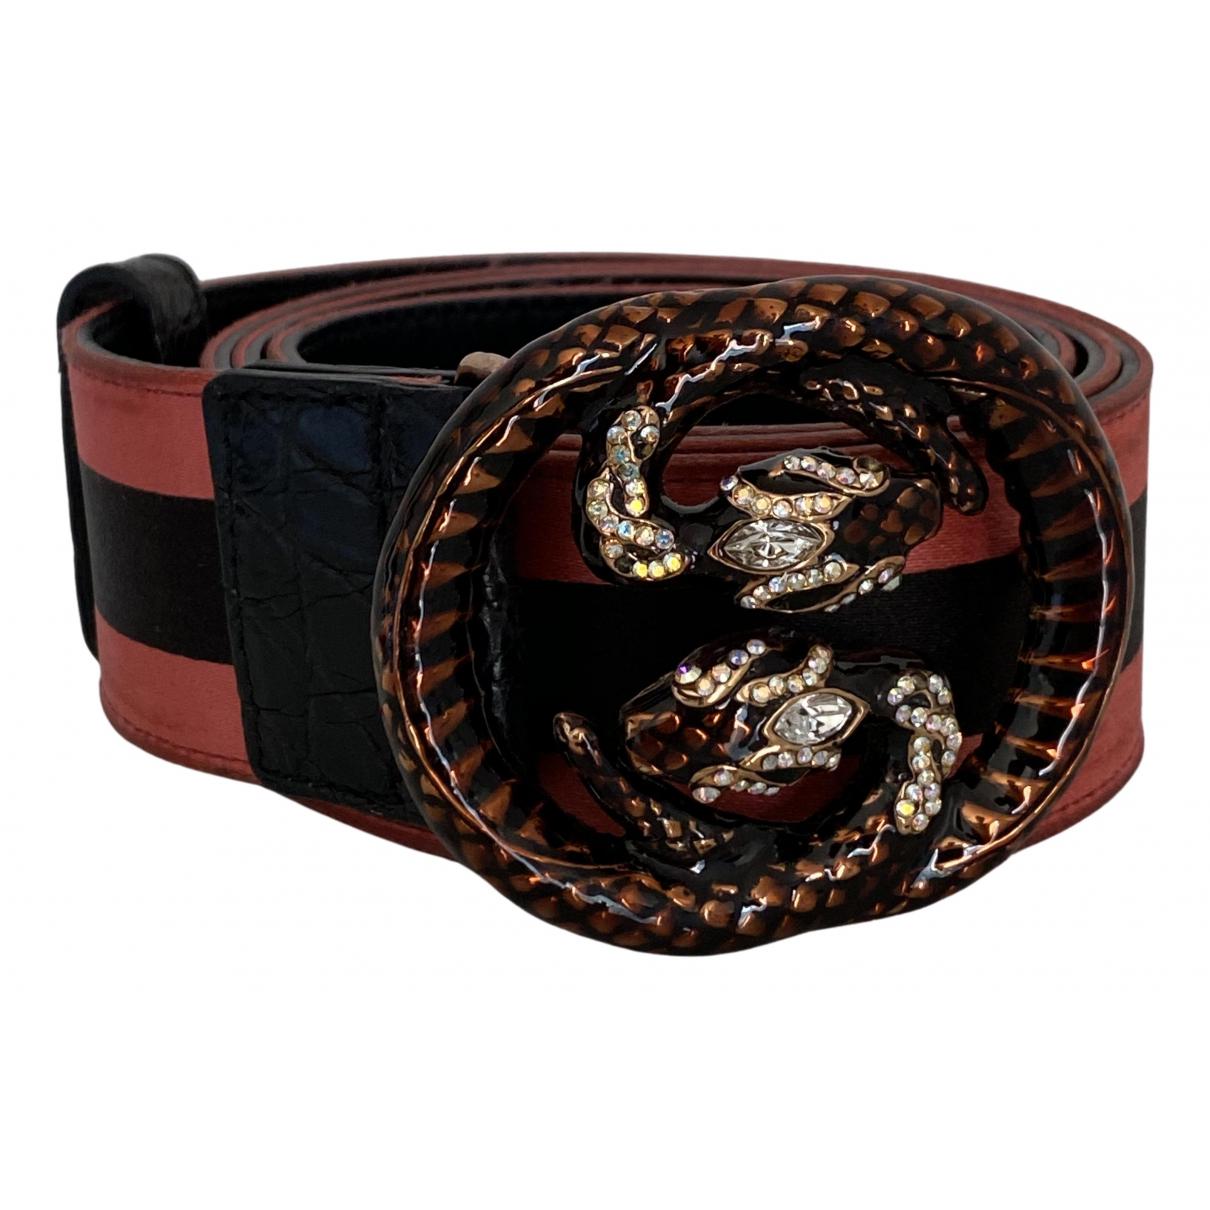 Gucci N Multicolour Silk belt for Women 90 cm